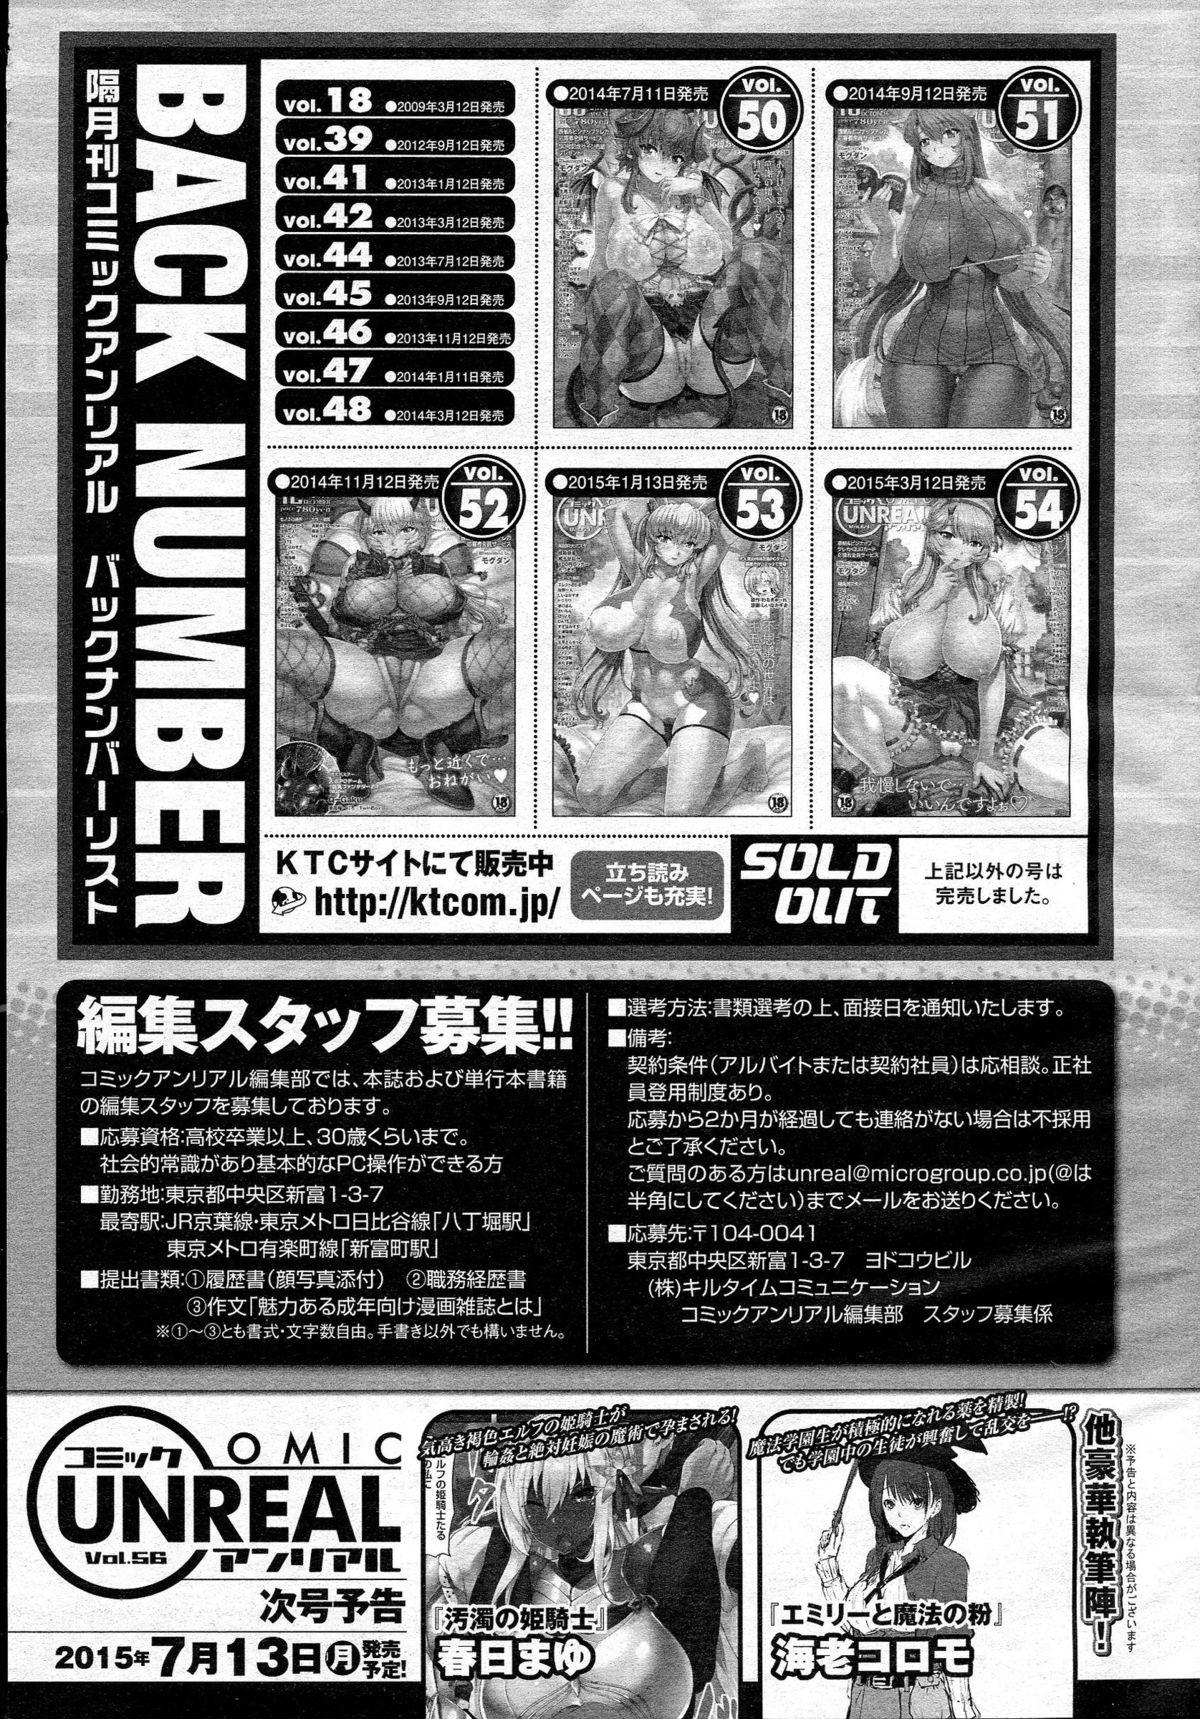 COMIC Unreal 2015-06 Vol. 55 + Hisasi Illust Shuu 454